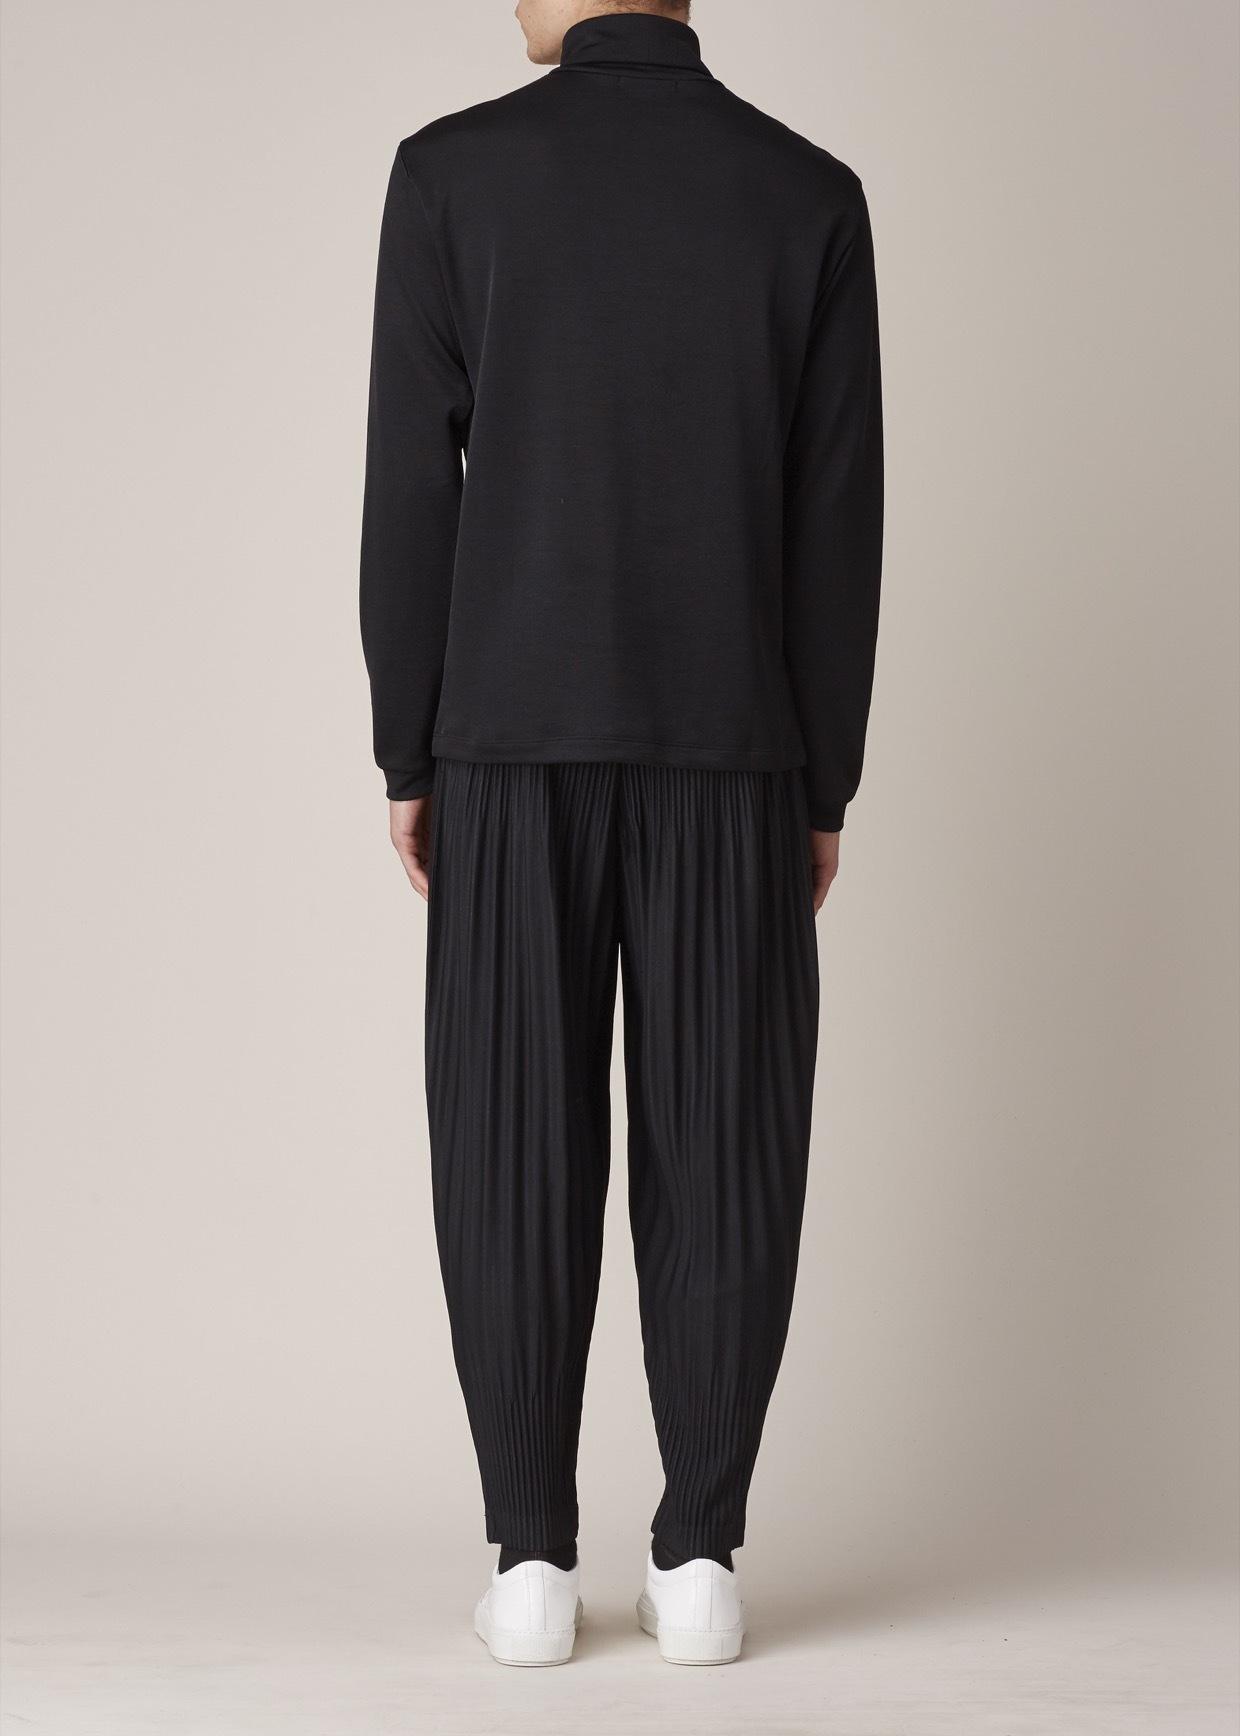 Homme plissé issey miyake Black Pleated Pants in Black for Men | Lyst